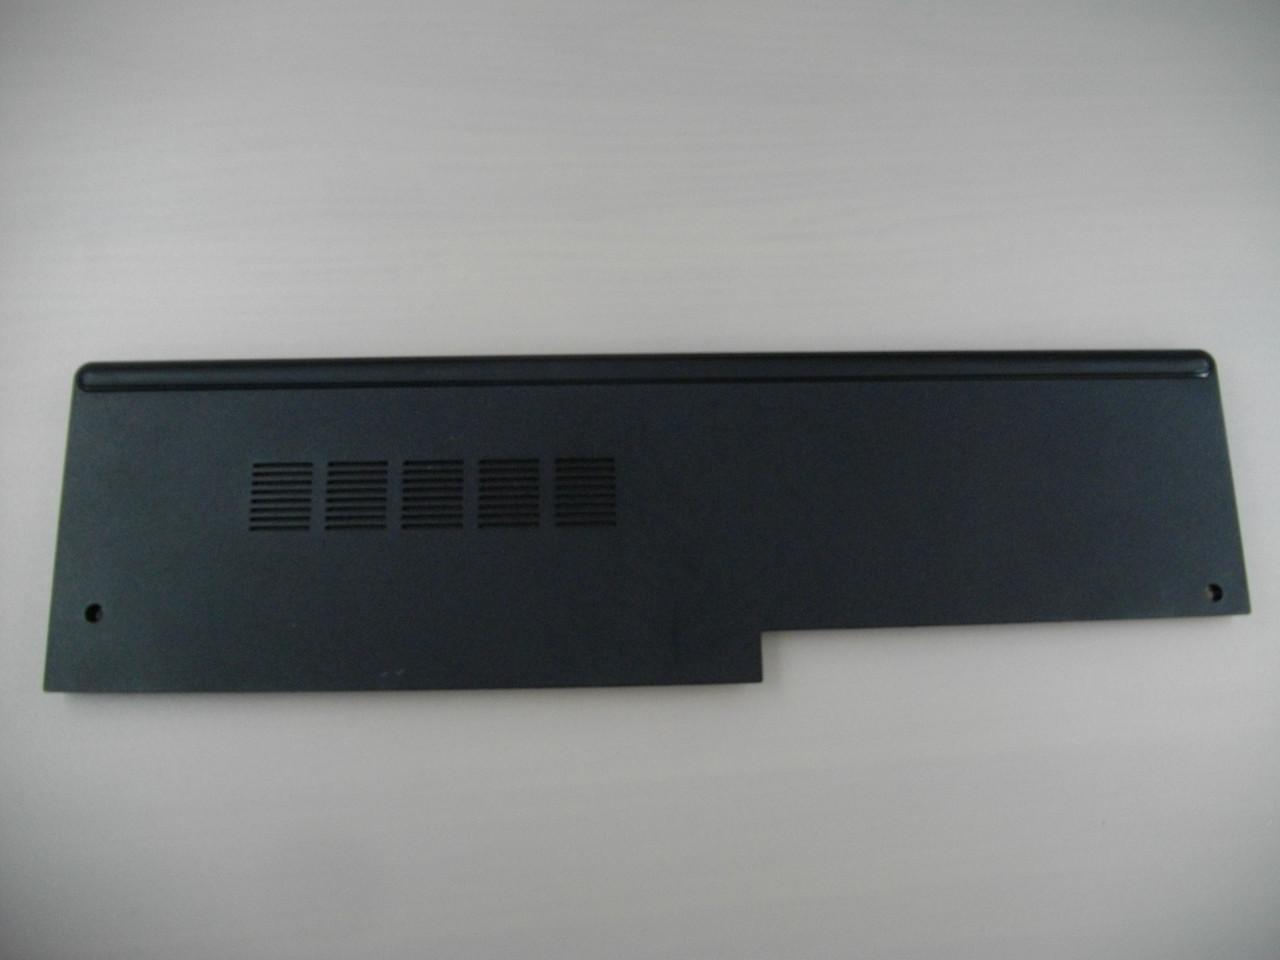 Корпус Крышка нижней части корпуса DELL Inspiron 5555. Dell inspiron 15 серии 5000.